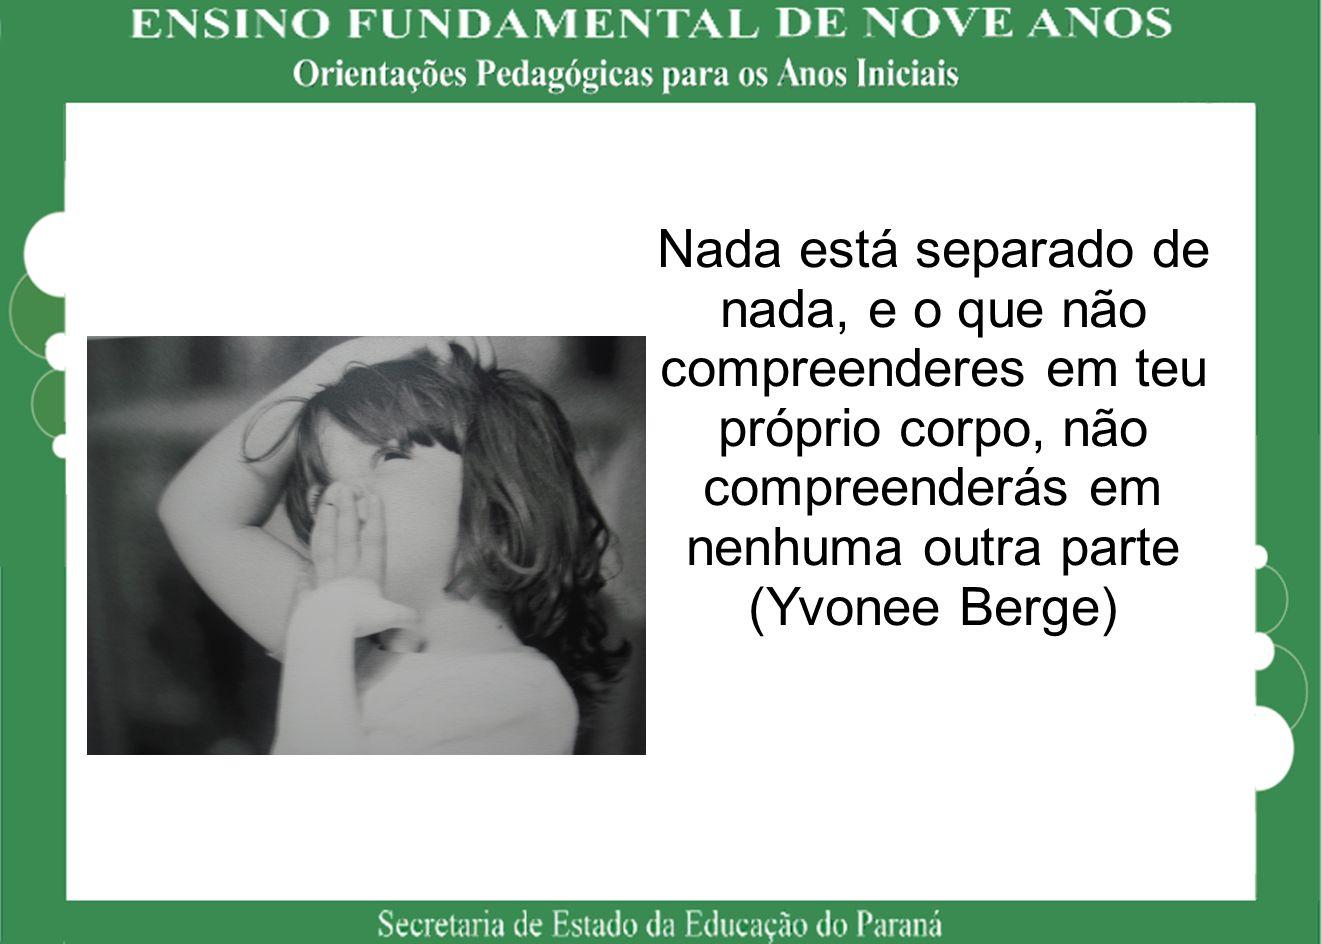 nenhuma outra parte (Yvonee Berge)